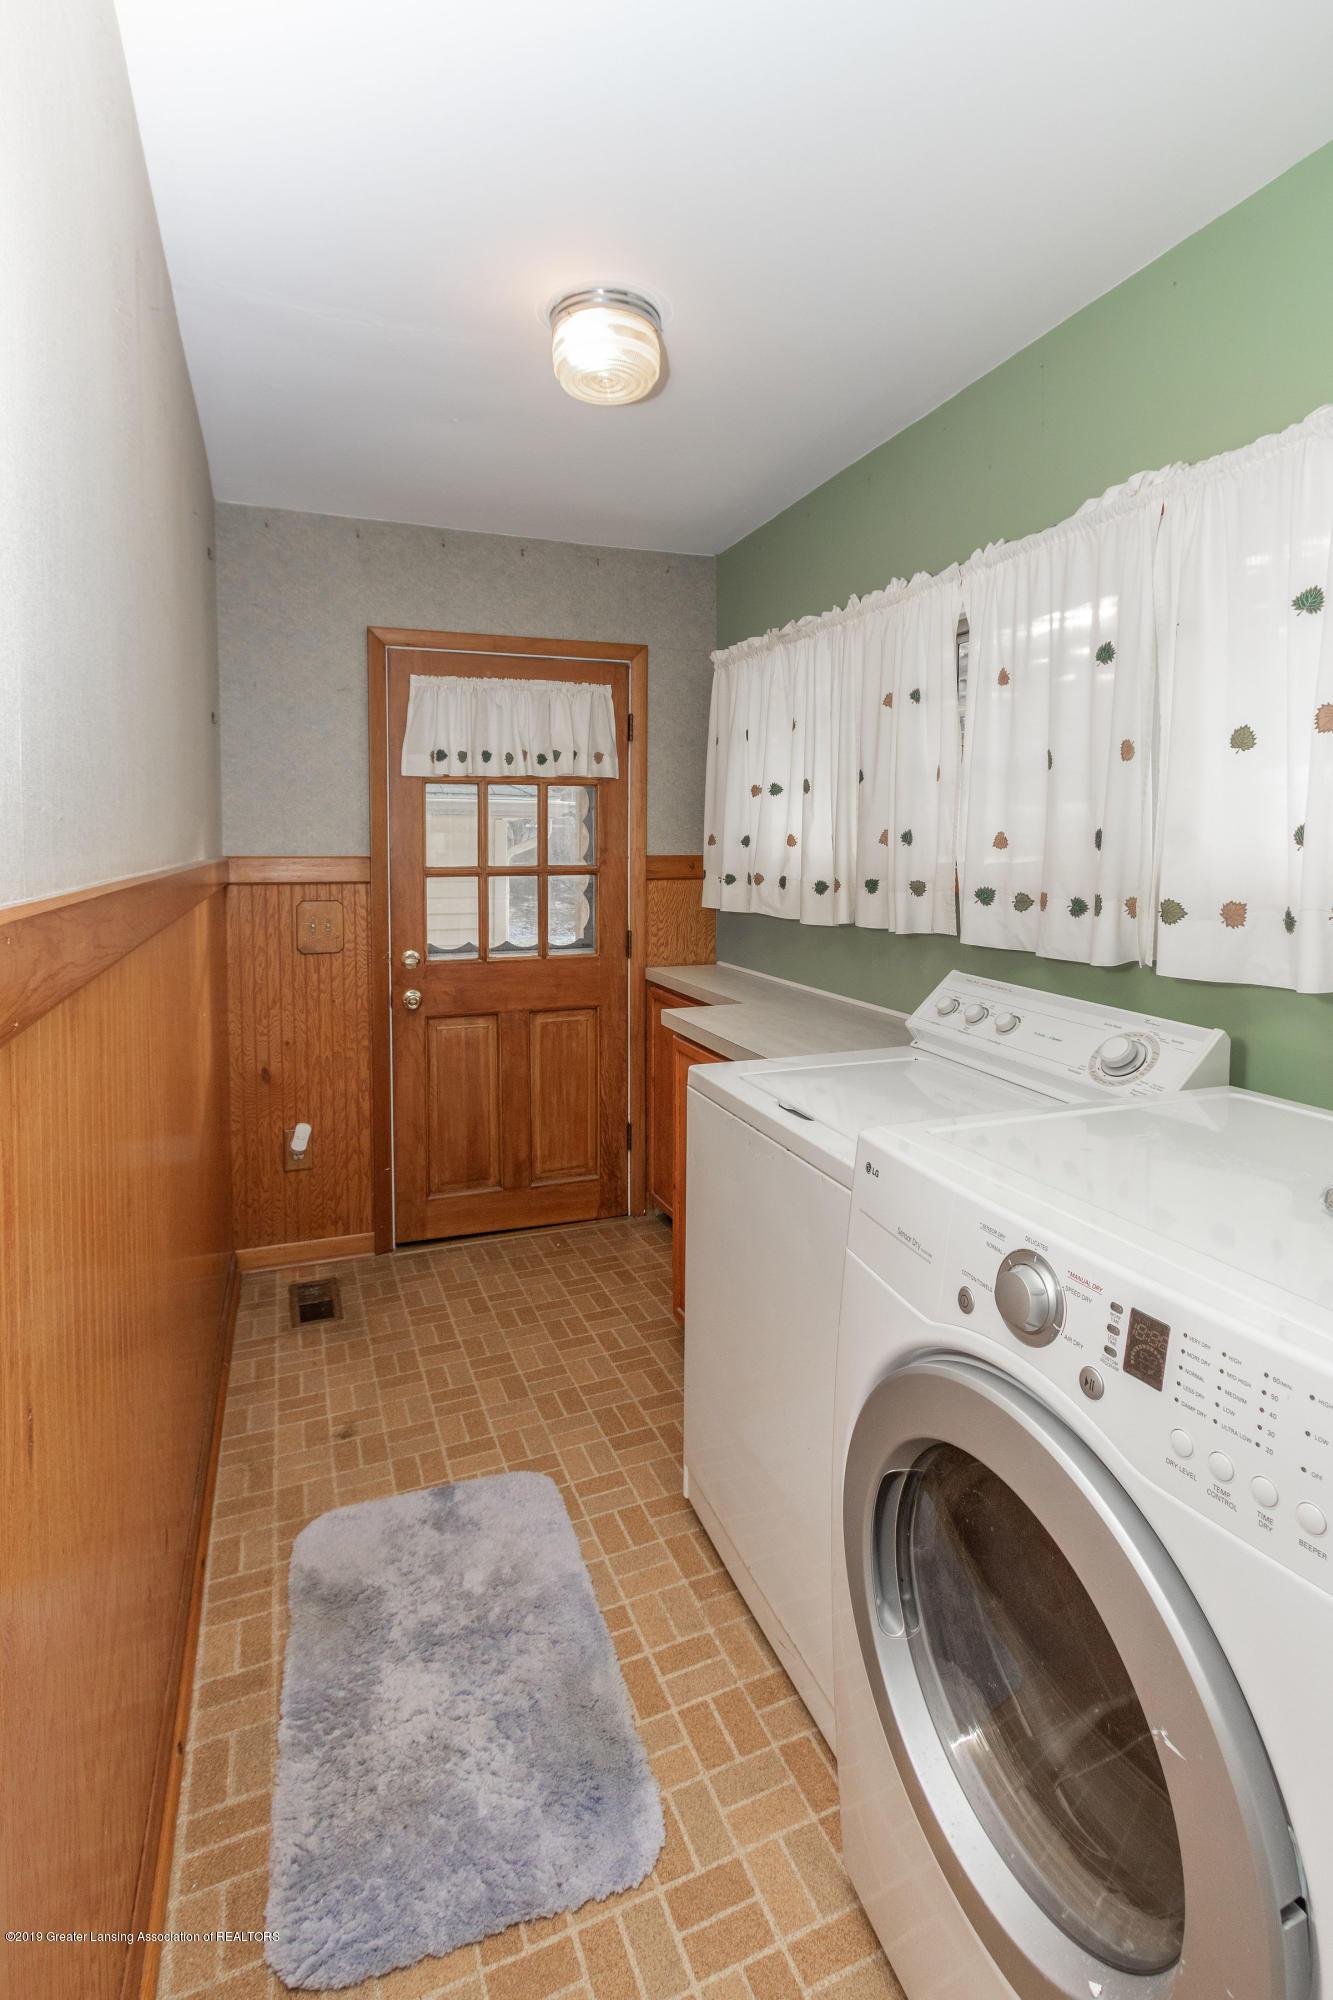 4411 Keller Rd - Utility Room - 16